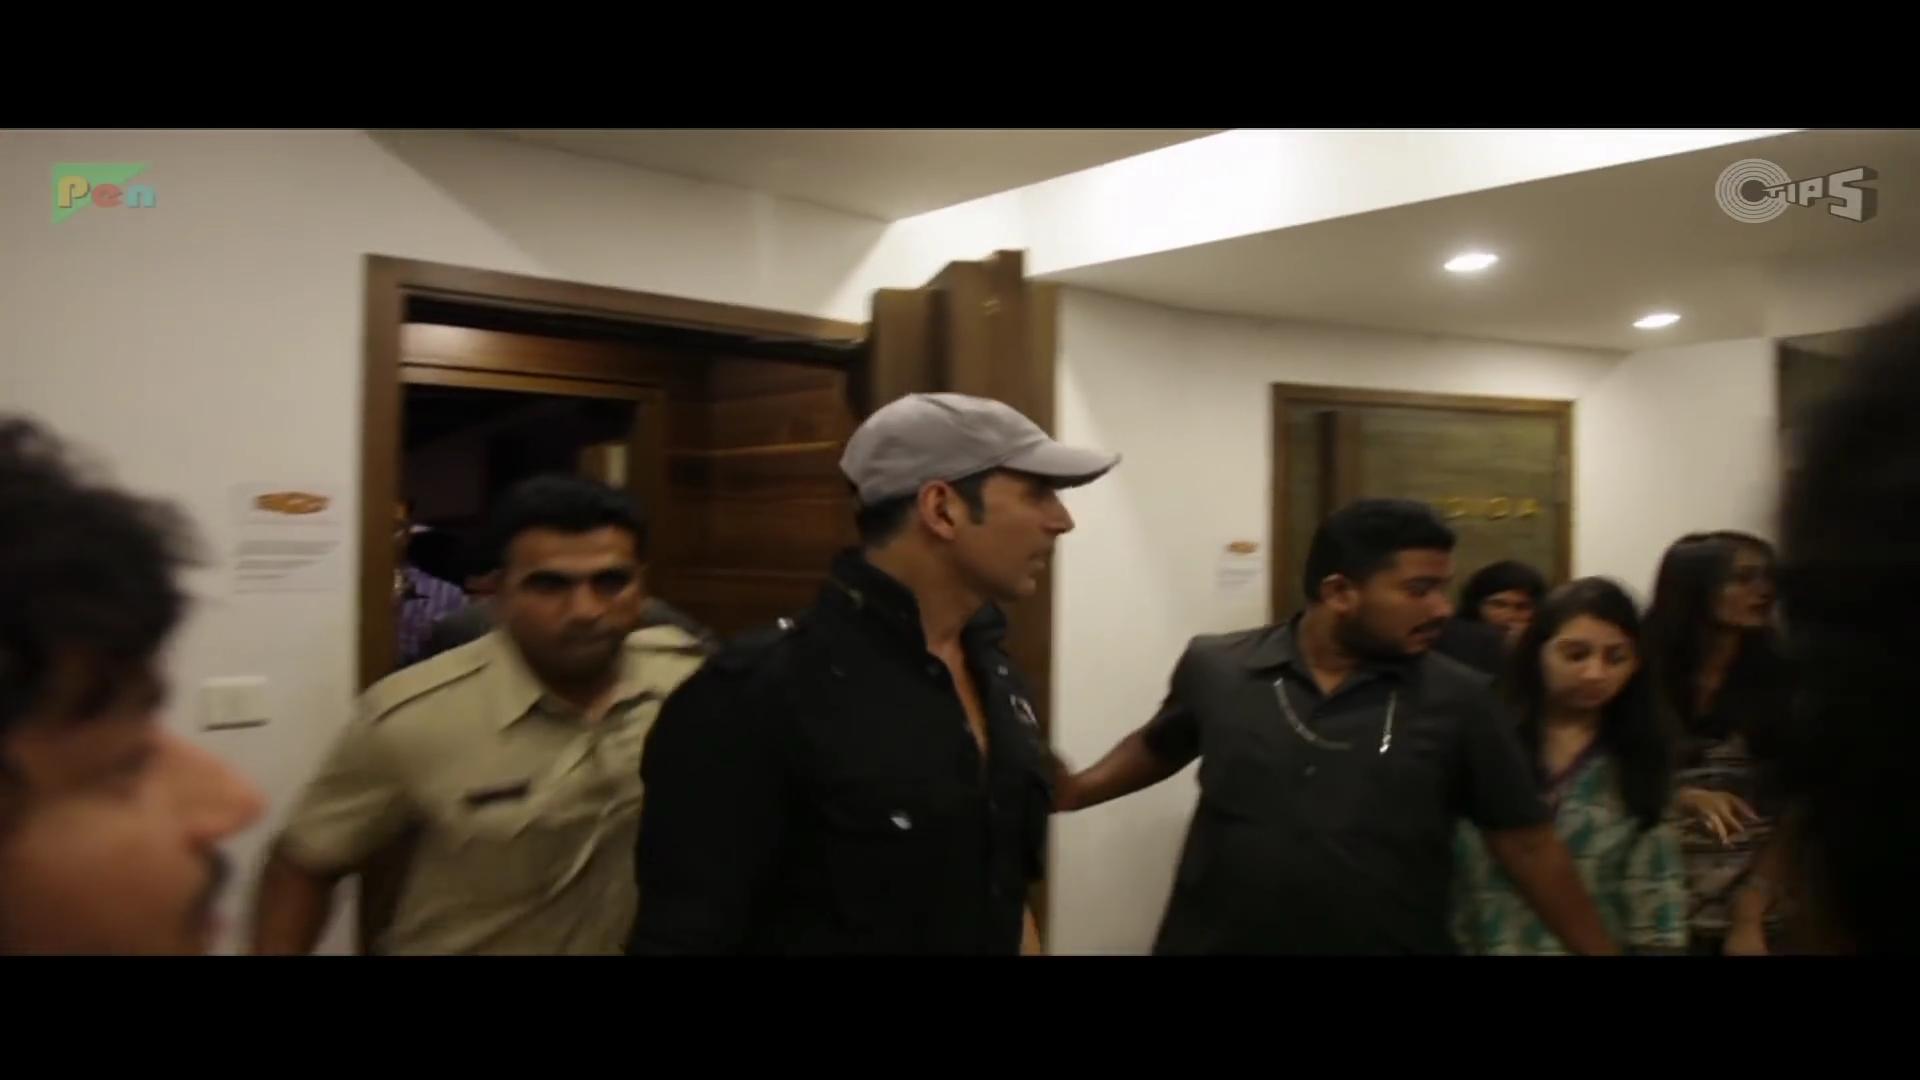 z_2014 - Akshay Kumar Sings  Maange Maange - Entertainment_1080p.mp46685.jpg